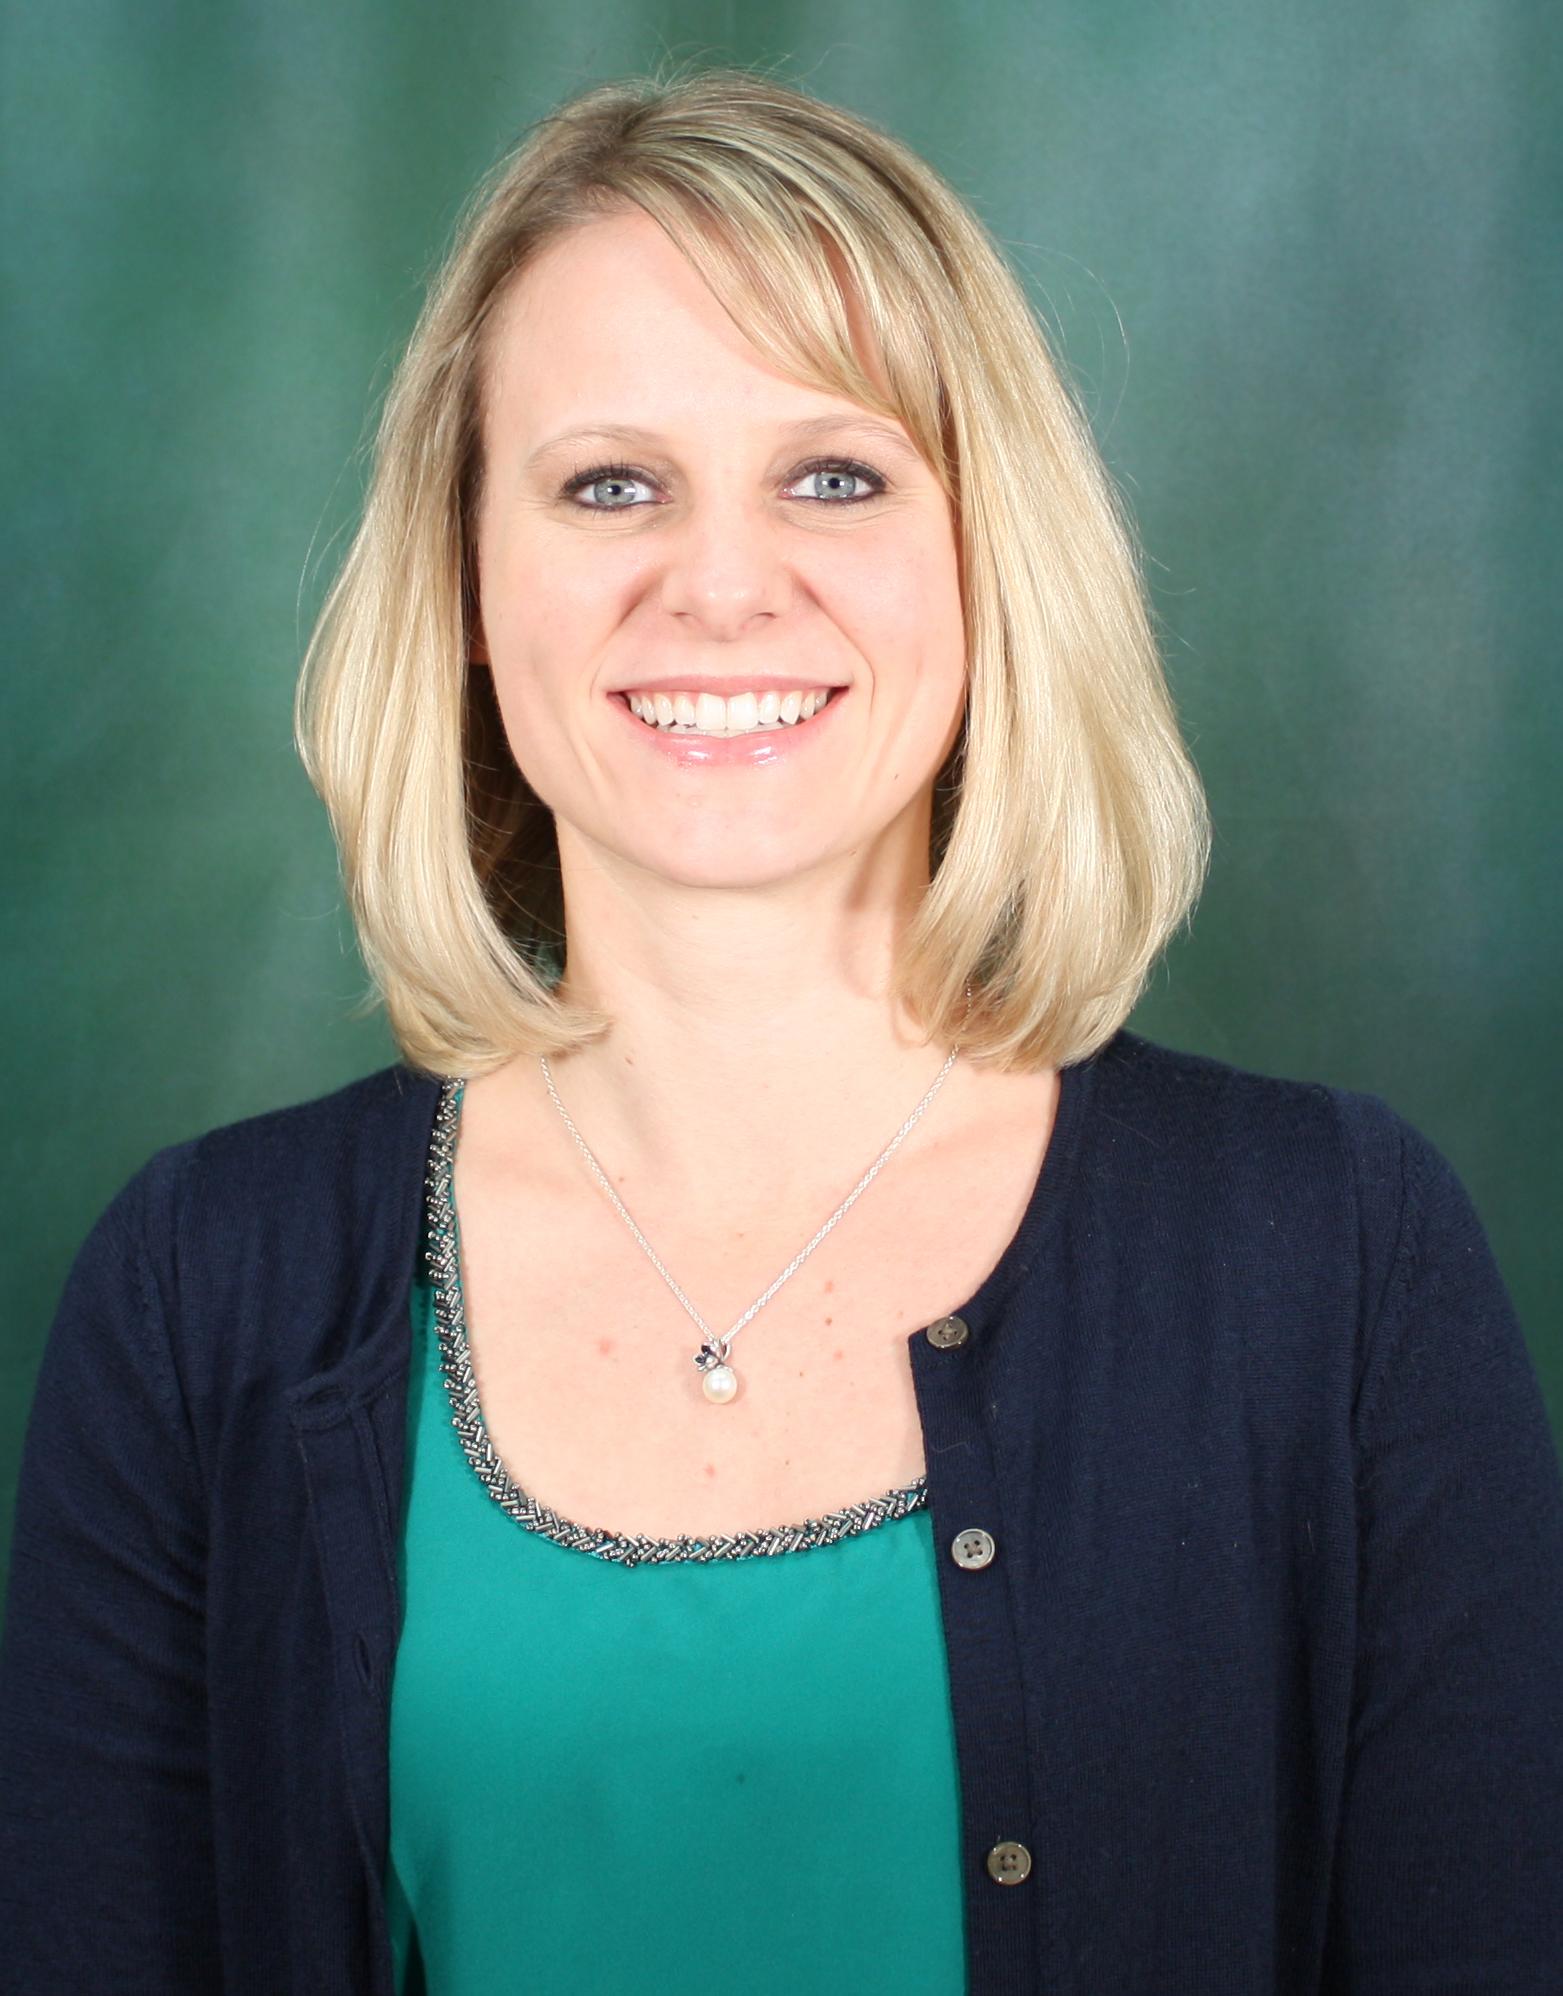 Tara Karns - Ph.D. in Life-Span Developmental Psychology - Psychology - Subject Matter Expert from Kolabtree